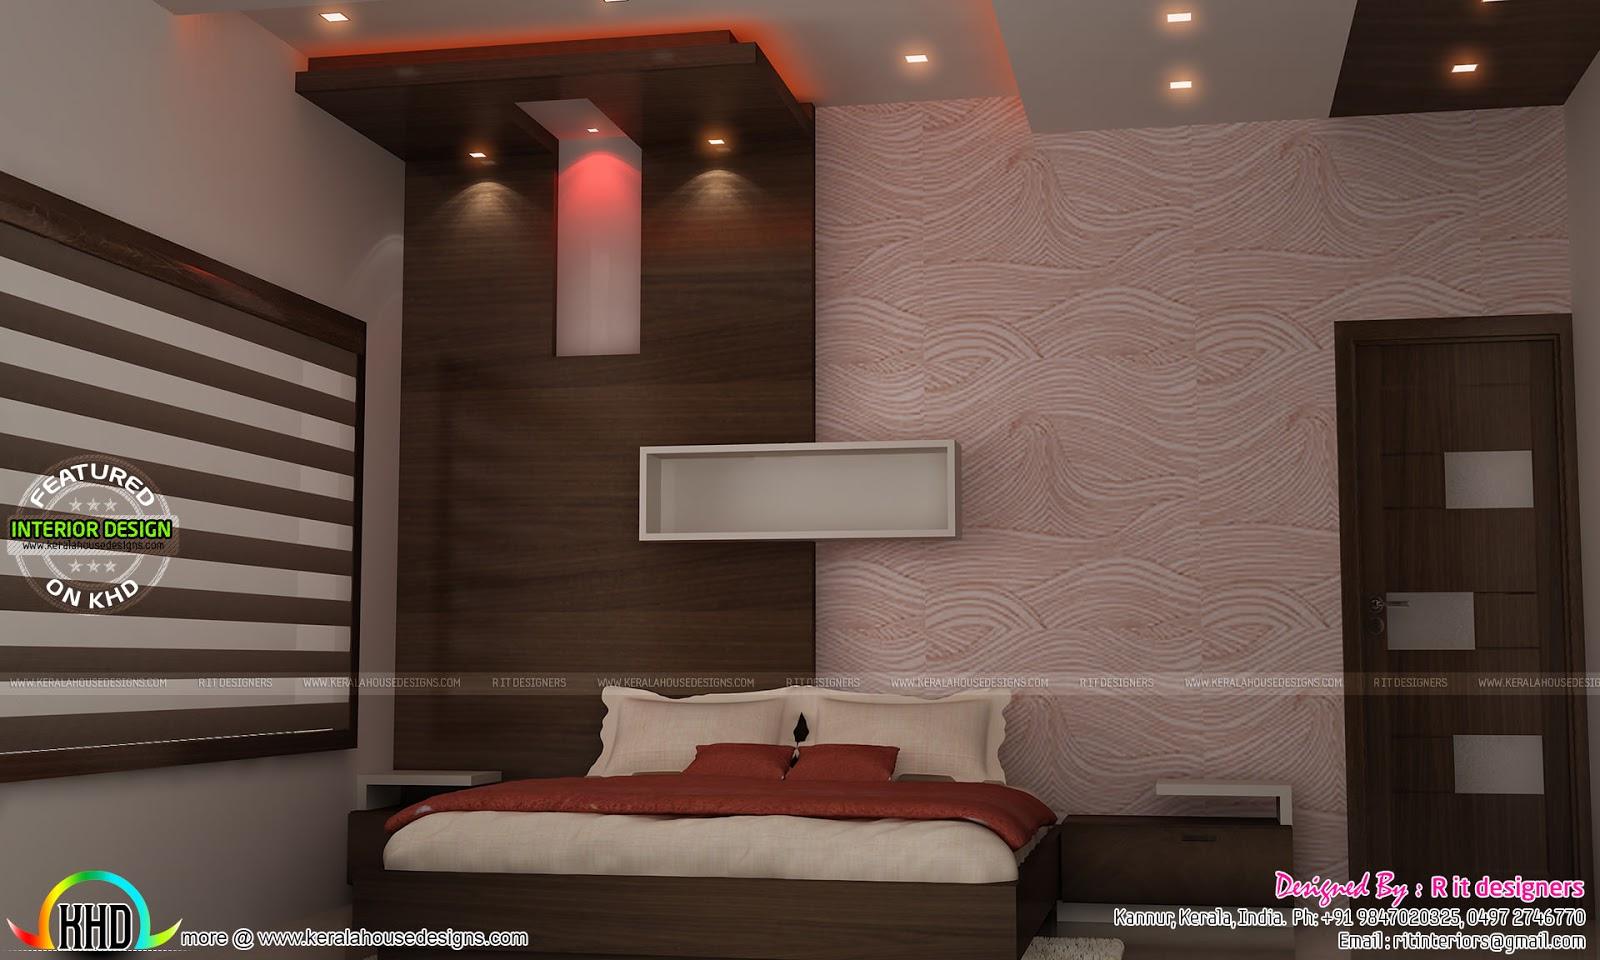 Wall Paper Design Kerala , HD Wallpaper & Backgrounds